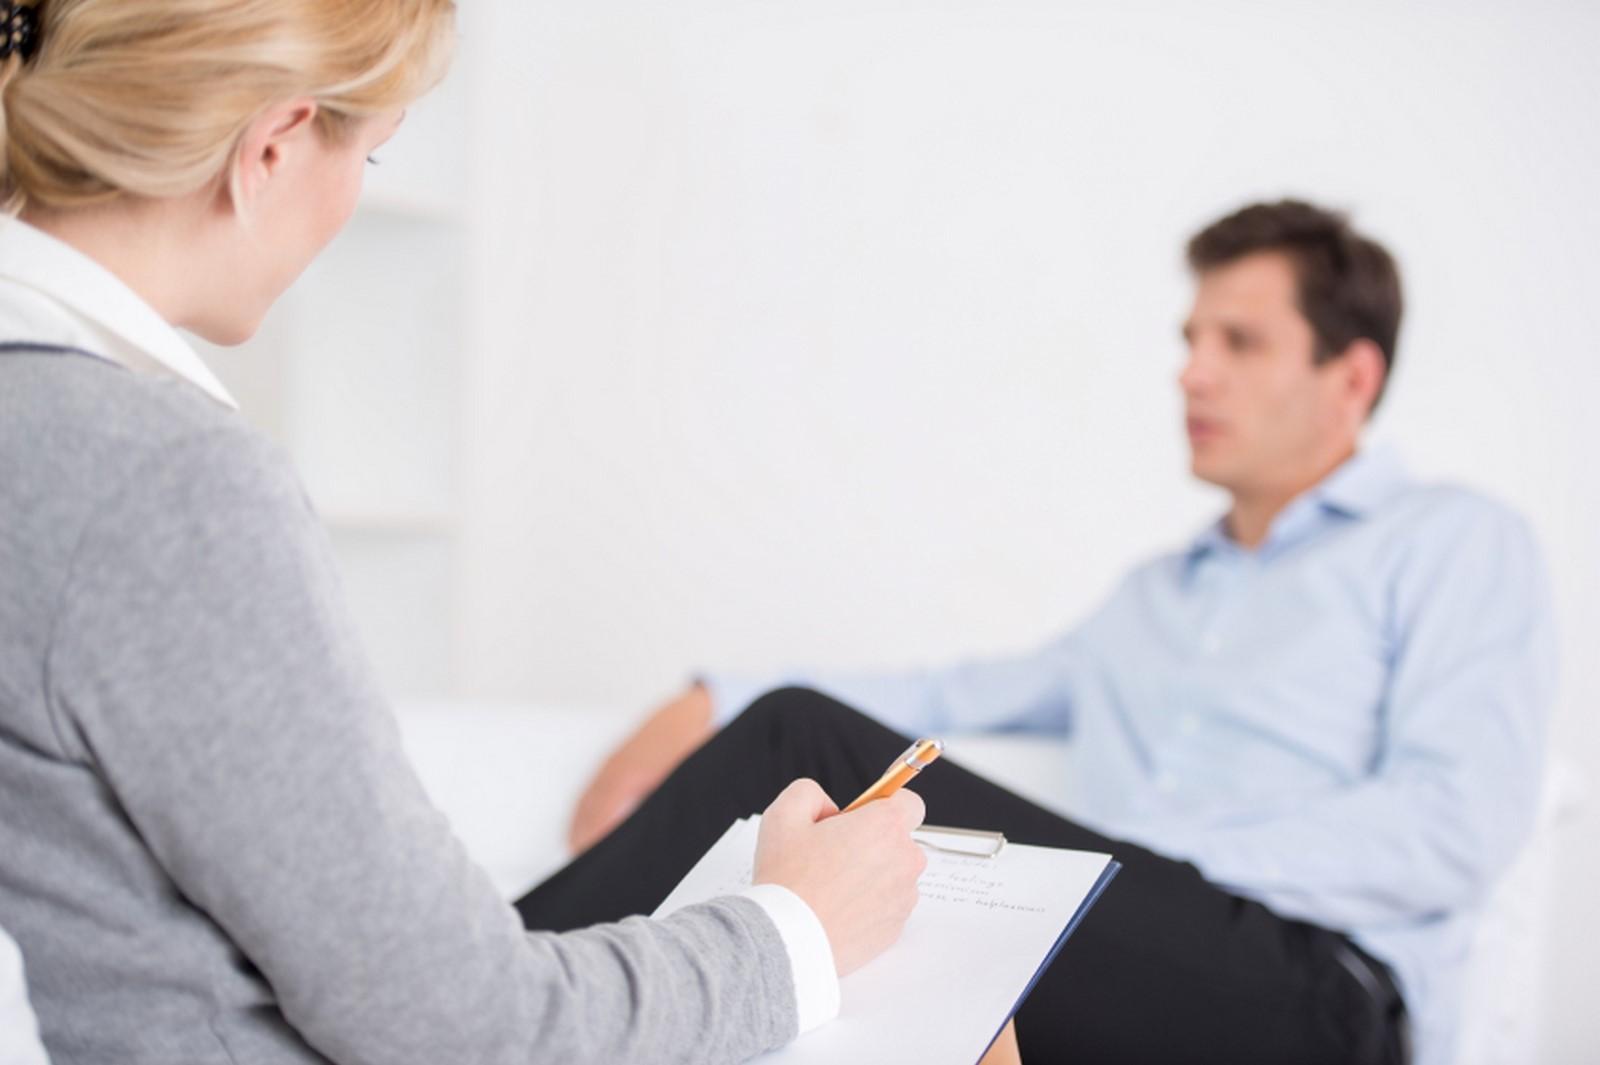 Альтернативные техники в работе педагога-психолога